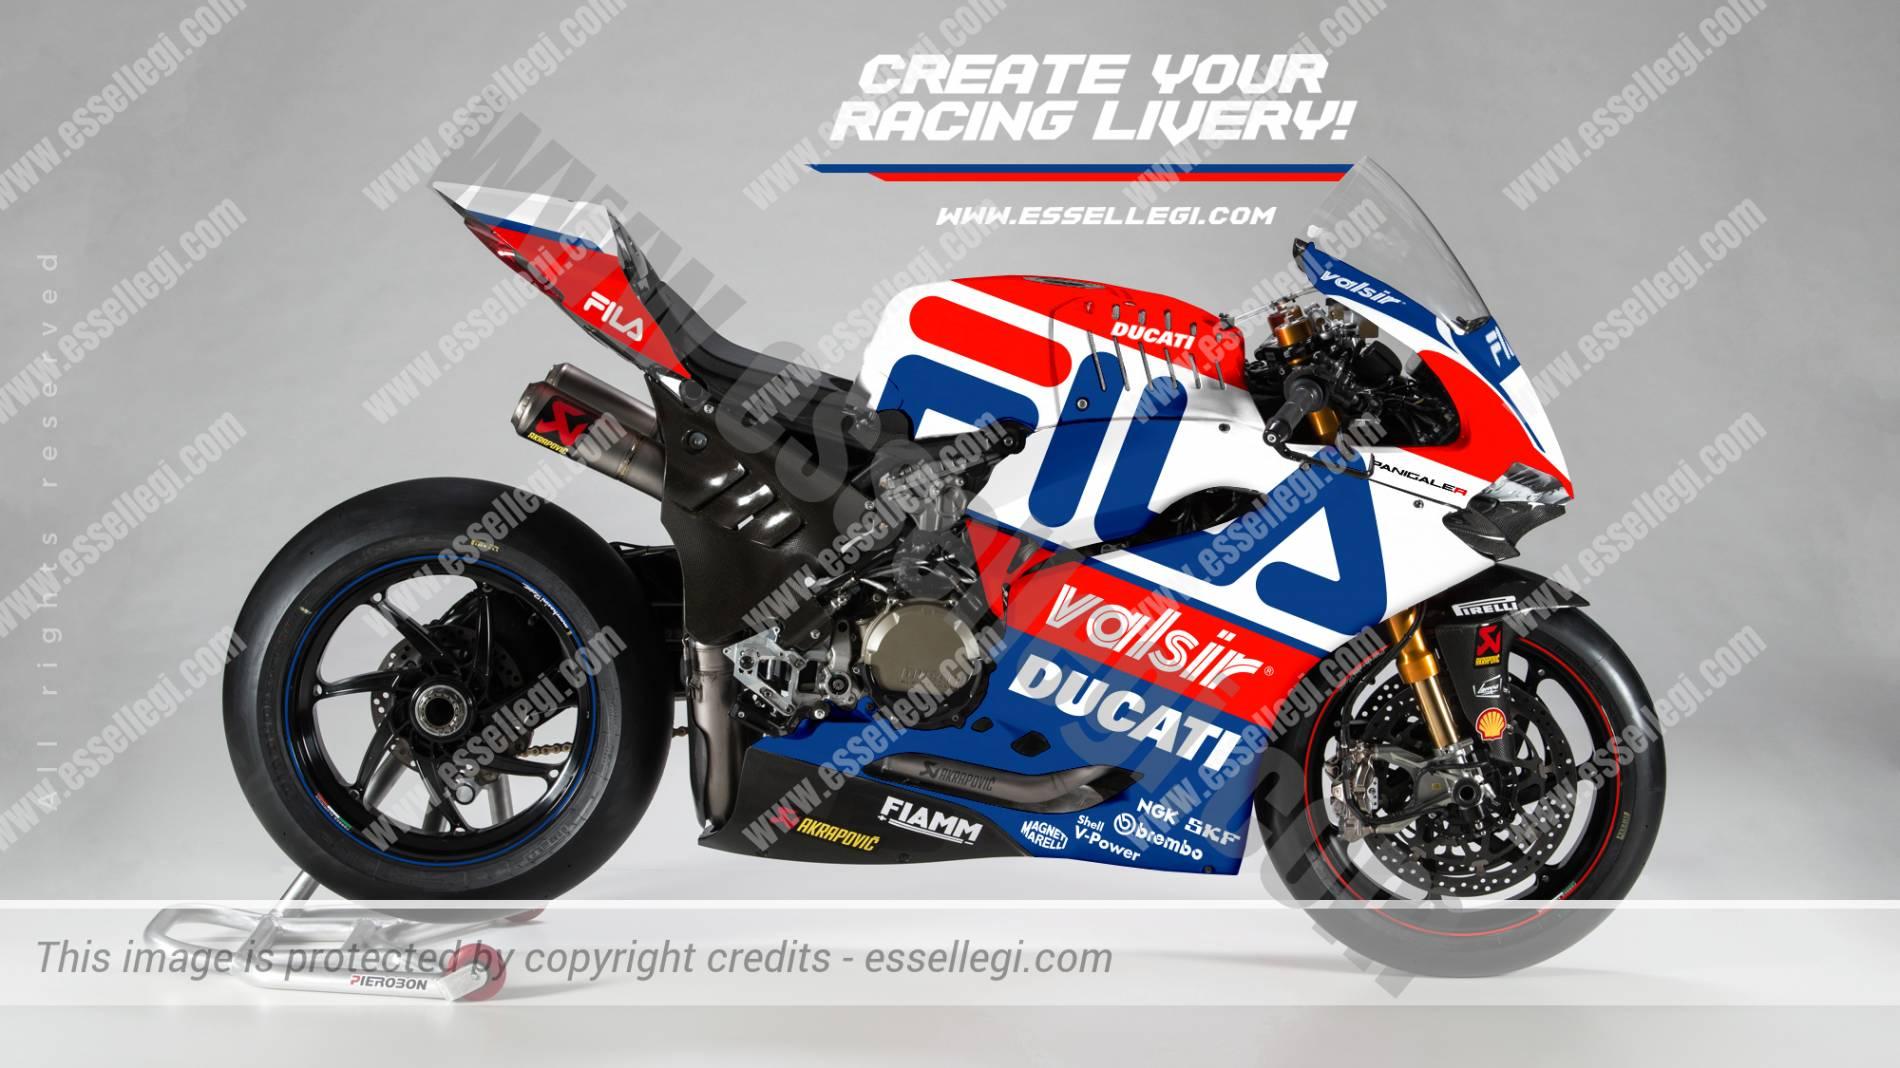 DUCATI 1299 PANIGALE R | FILA TRIBUTE RACING BIKE LIVERY